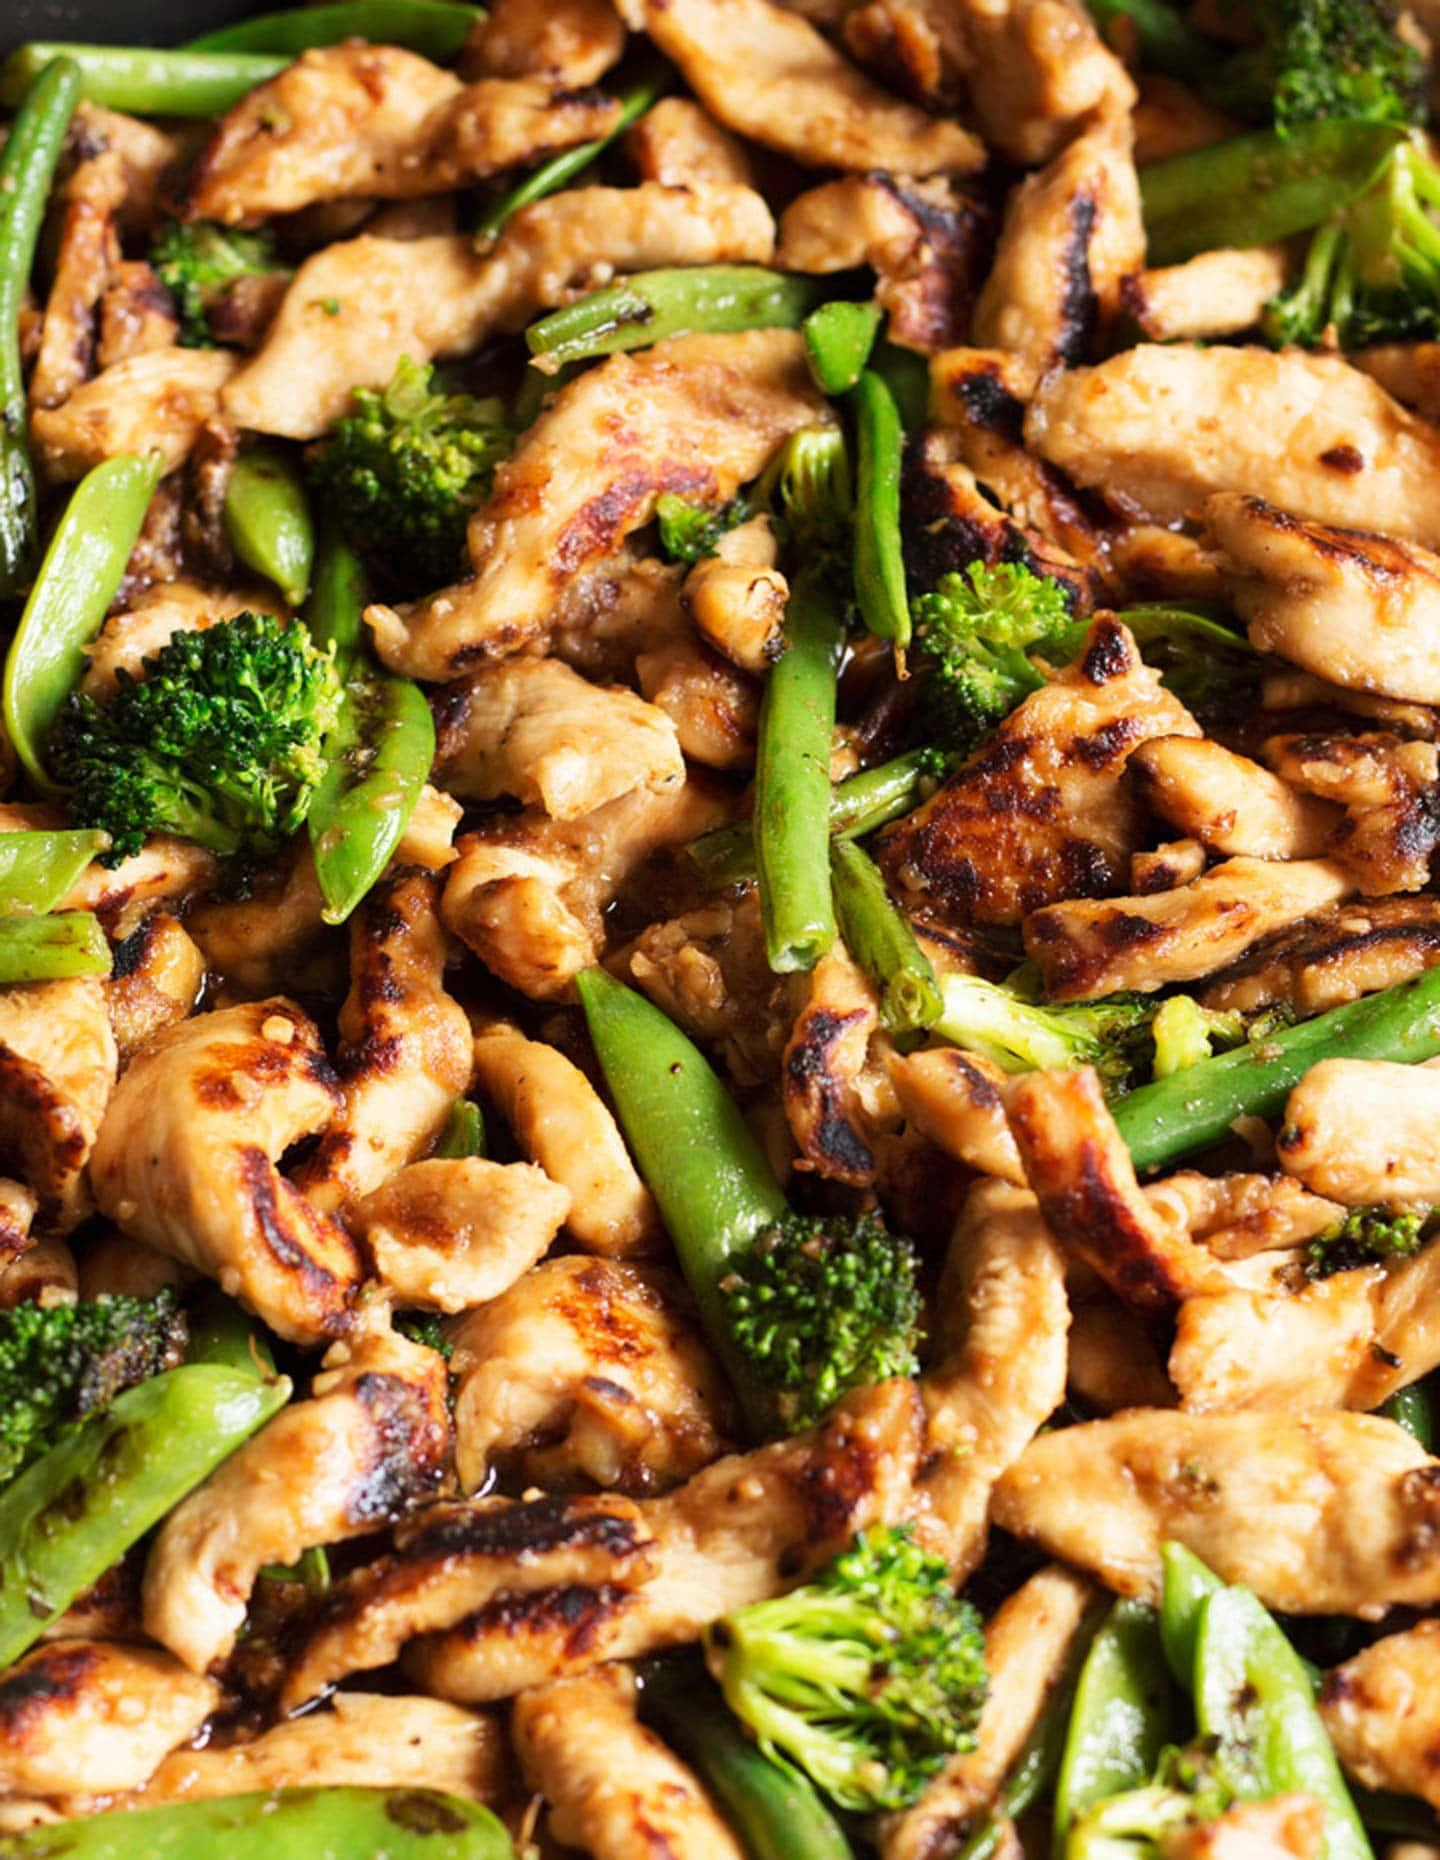 Chicken and veggies in stir-fry sauce